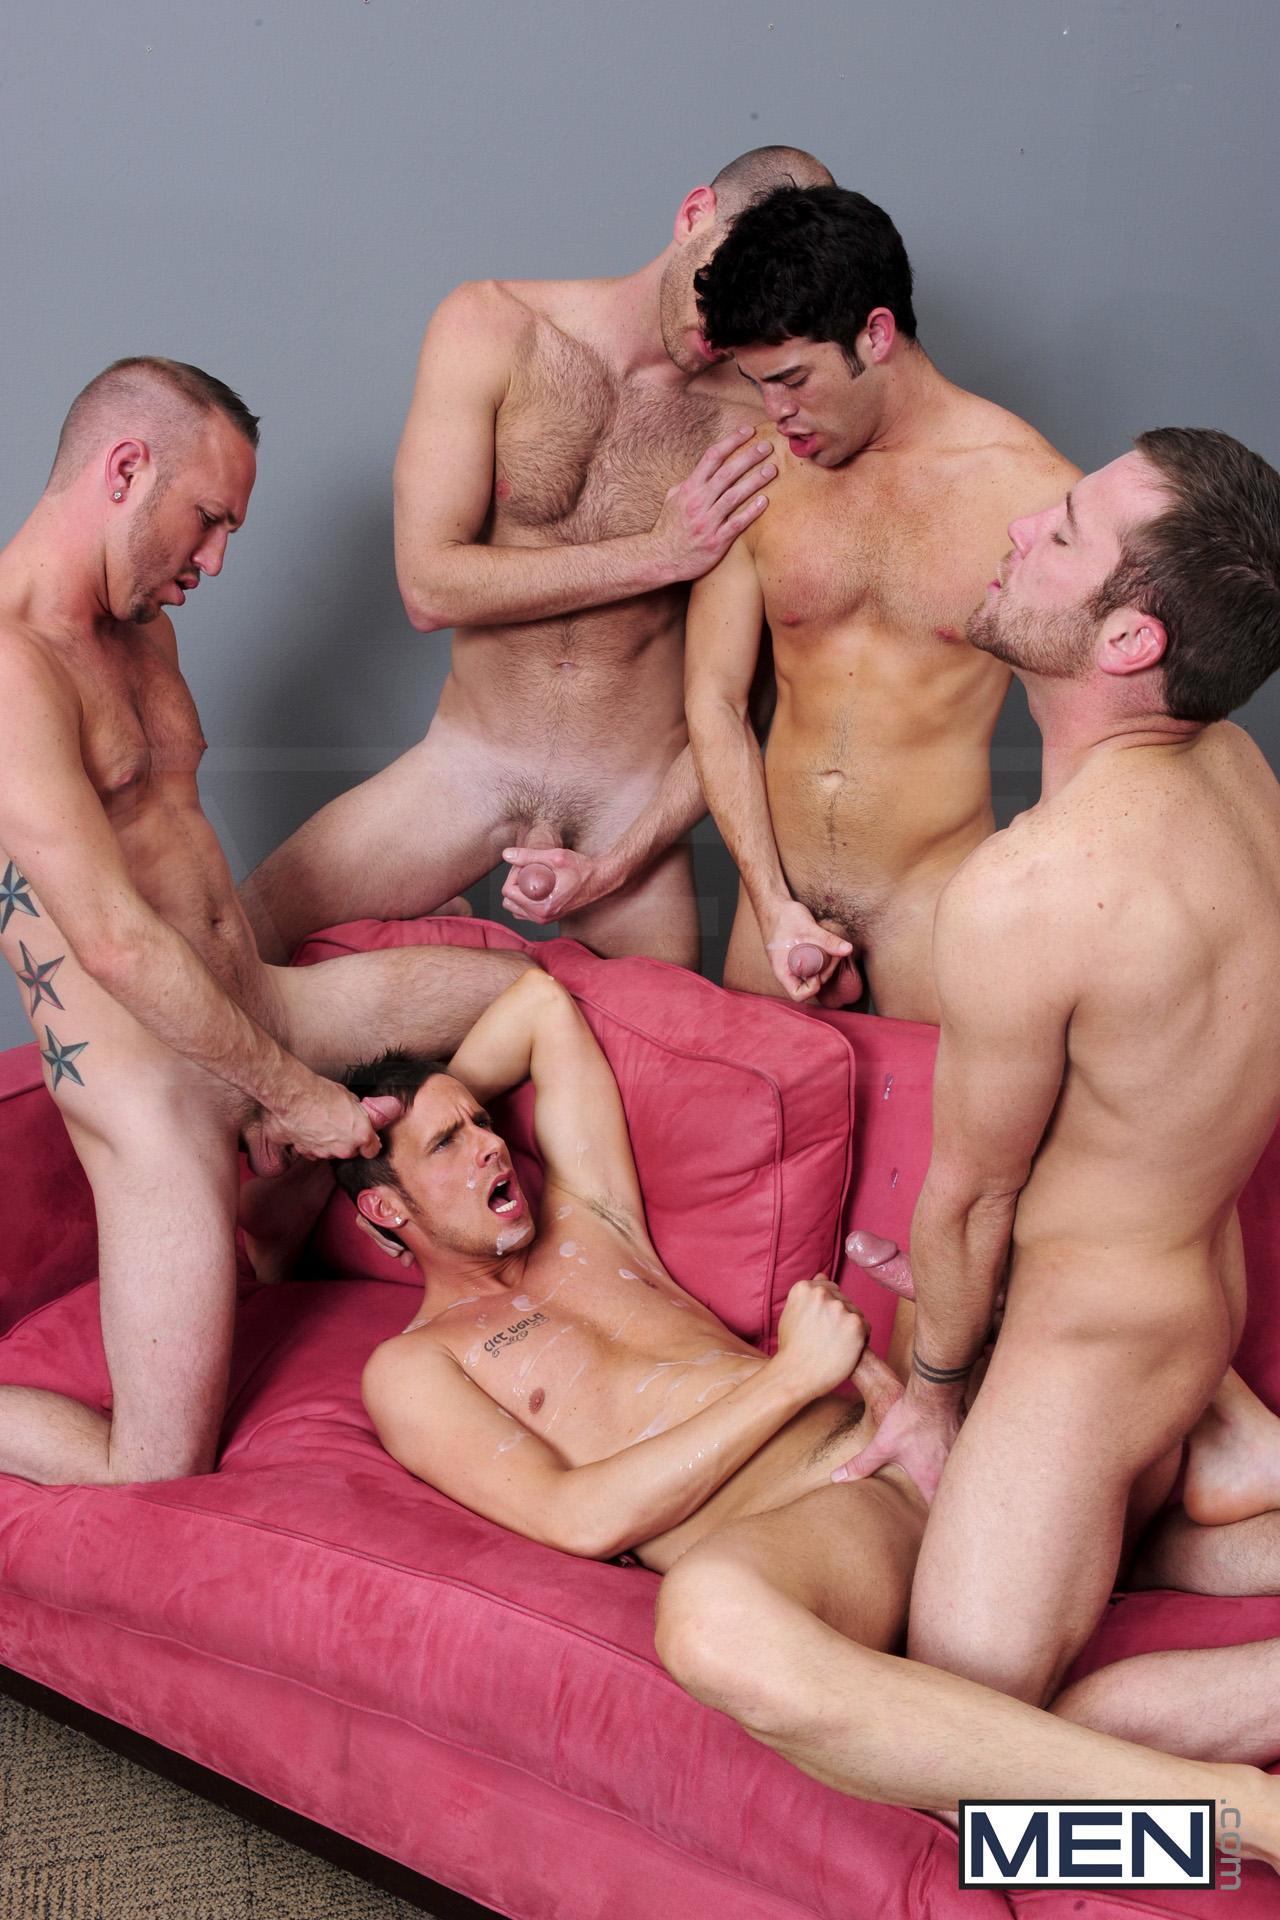 from Silas hot gay men xxx